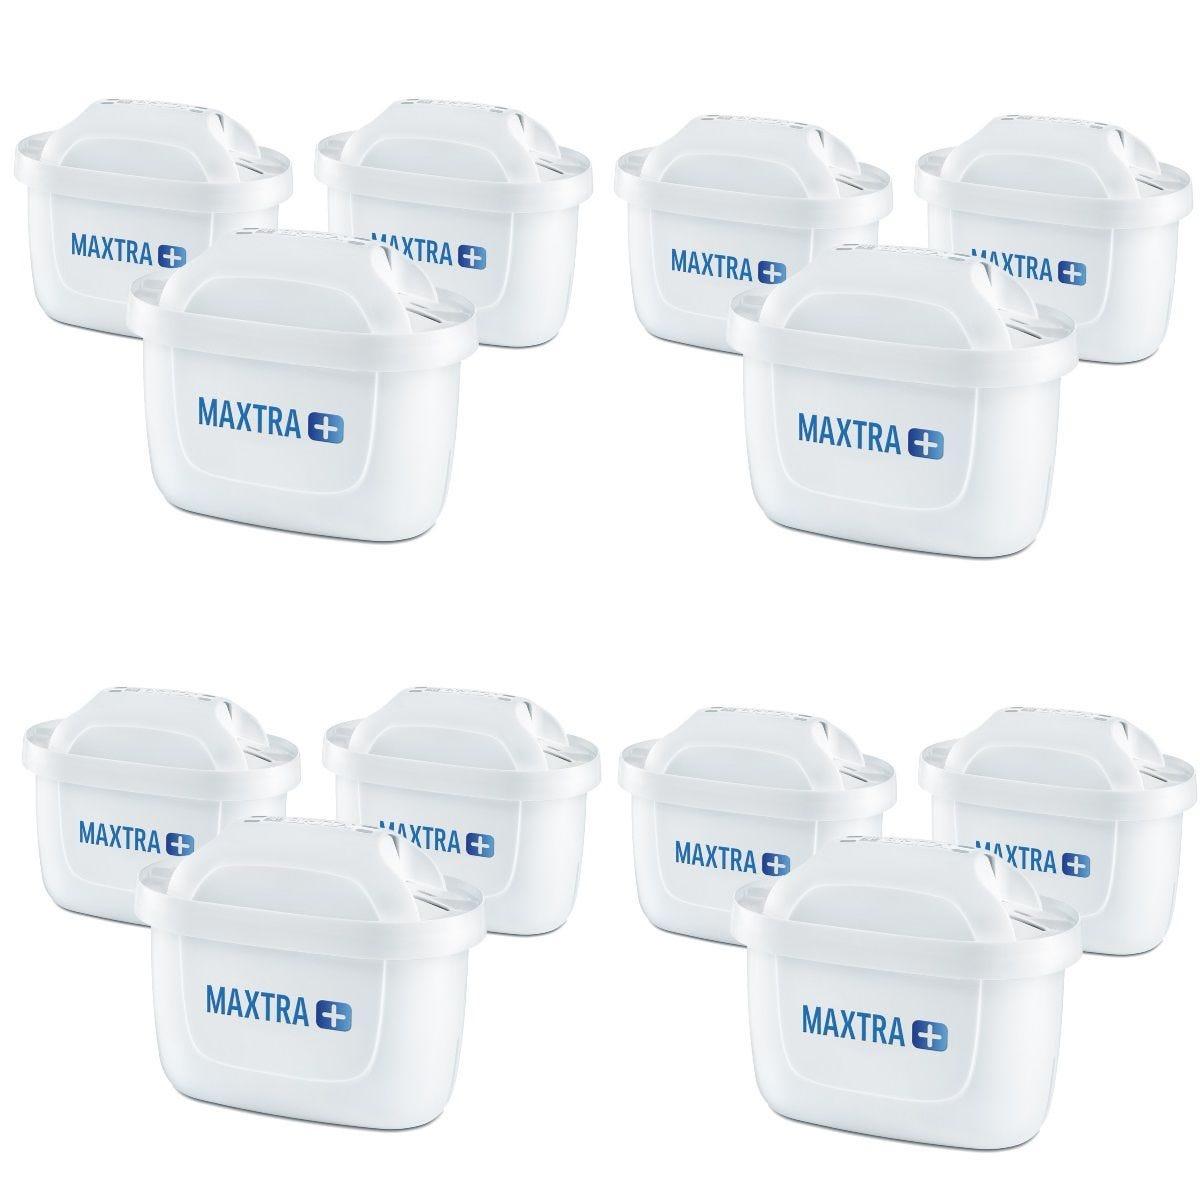 BRITA Maxtra+ Water Filter Cartridges - 12 Pack